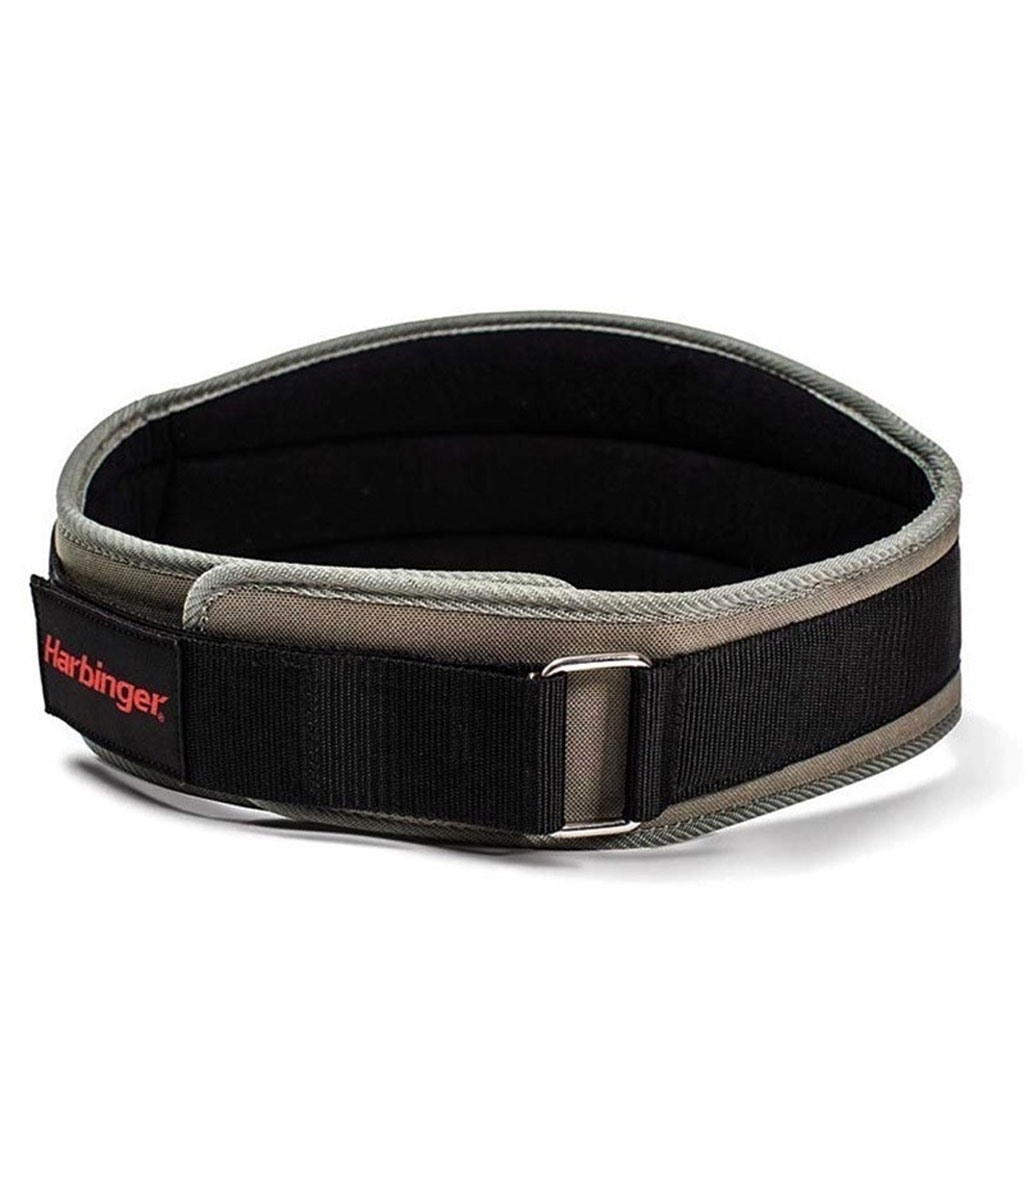 Harbinger Men's Contoured Flexfit Belt Kırmızı